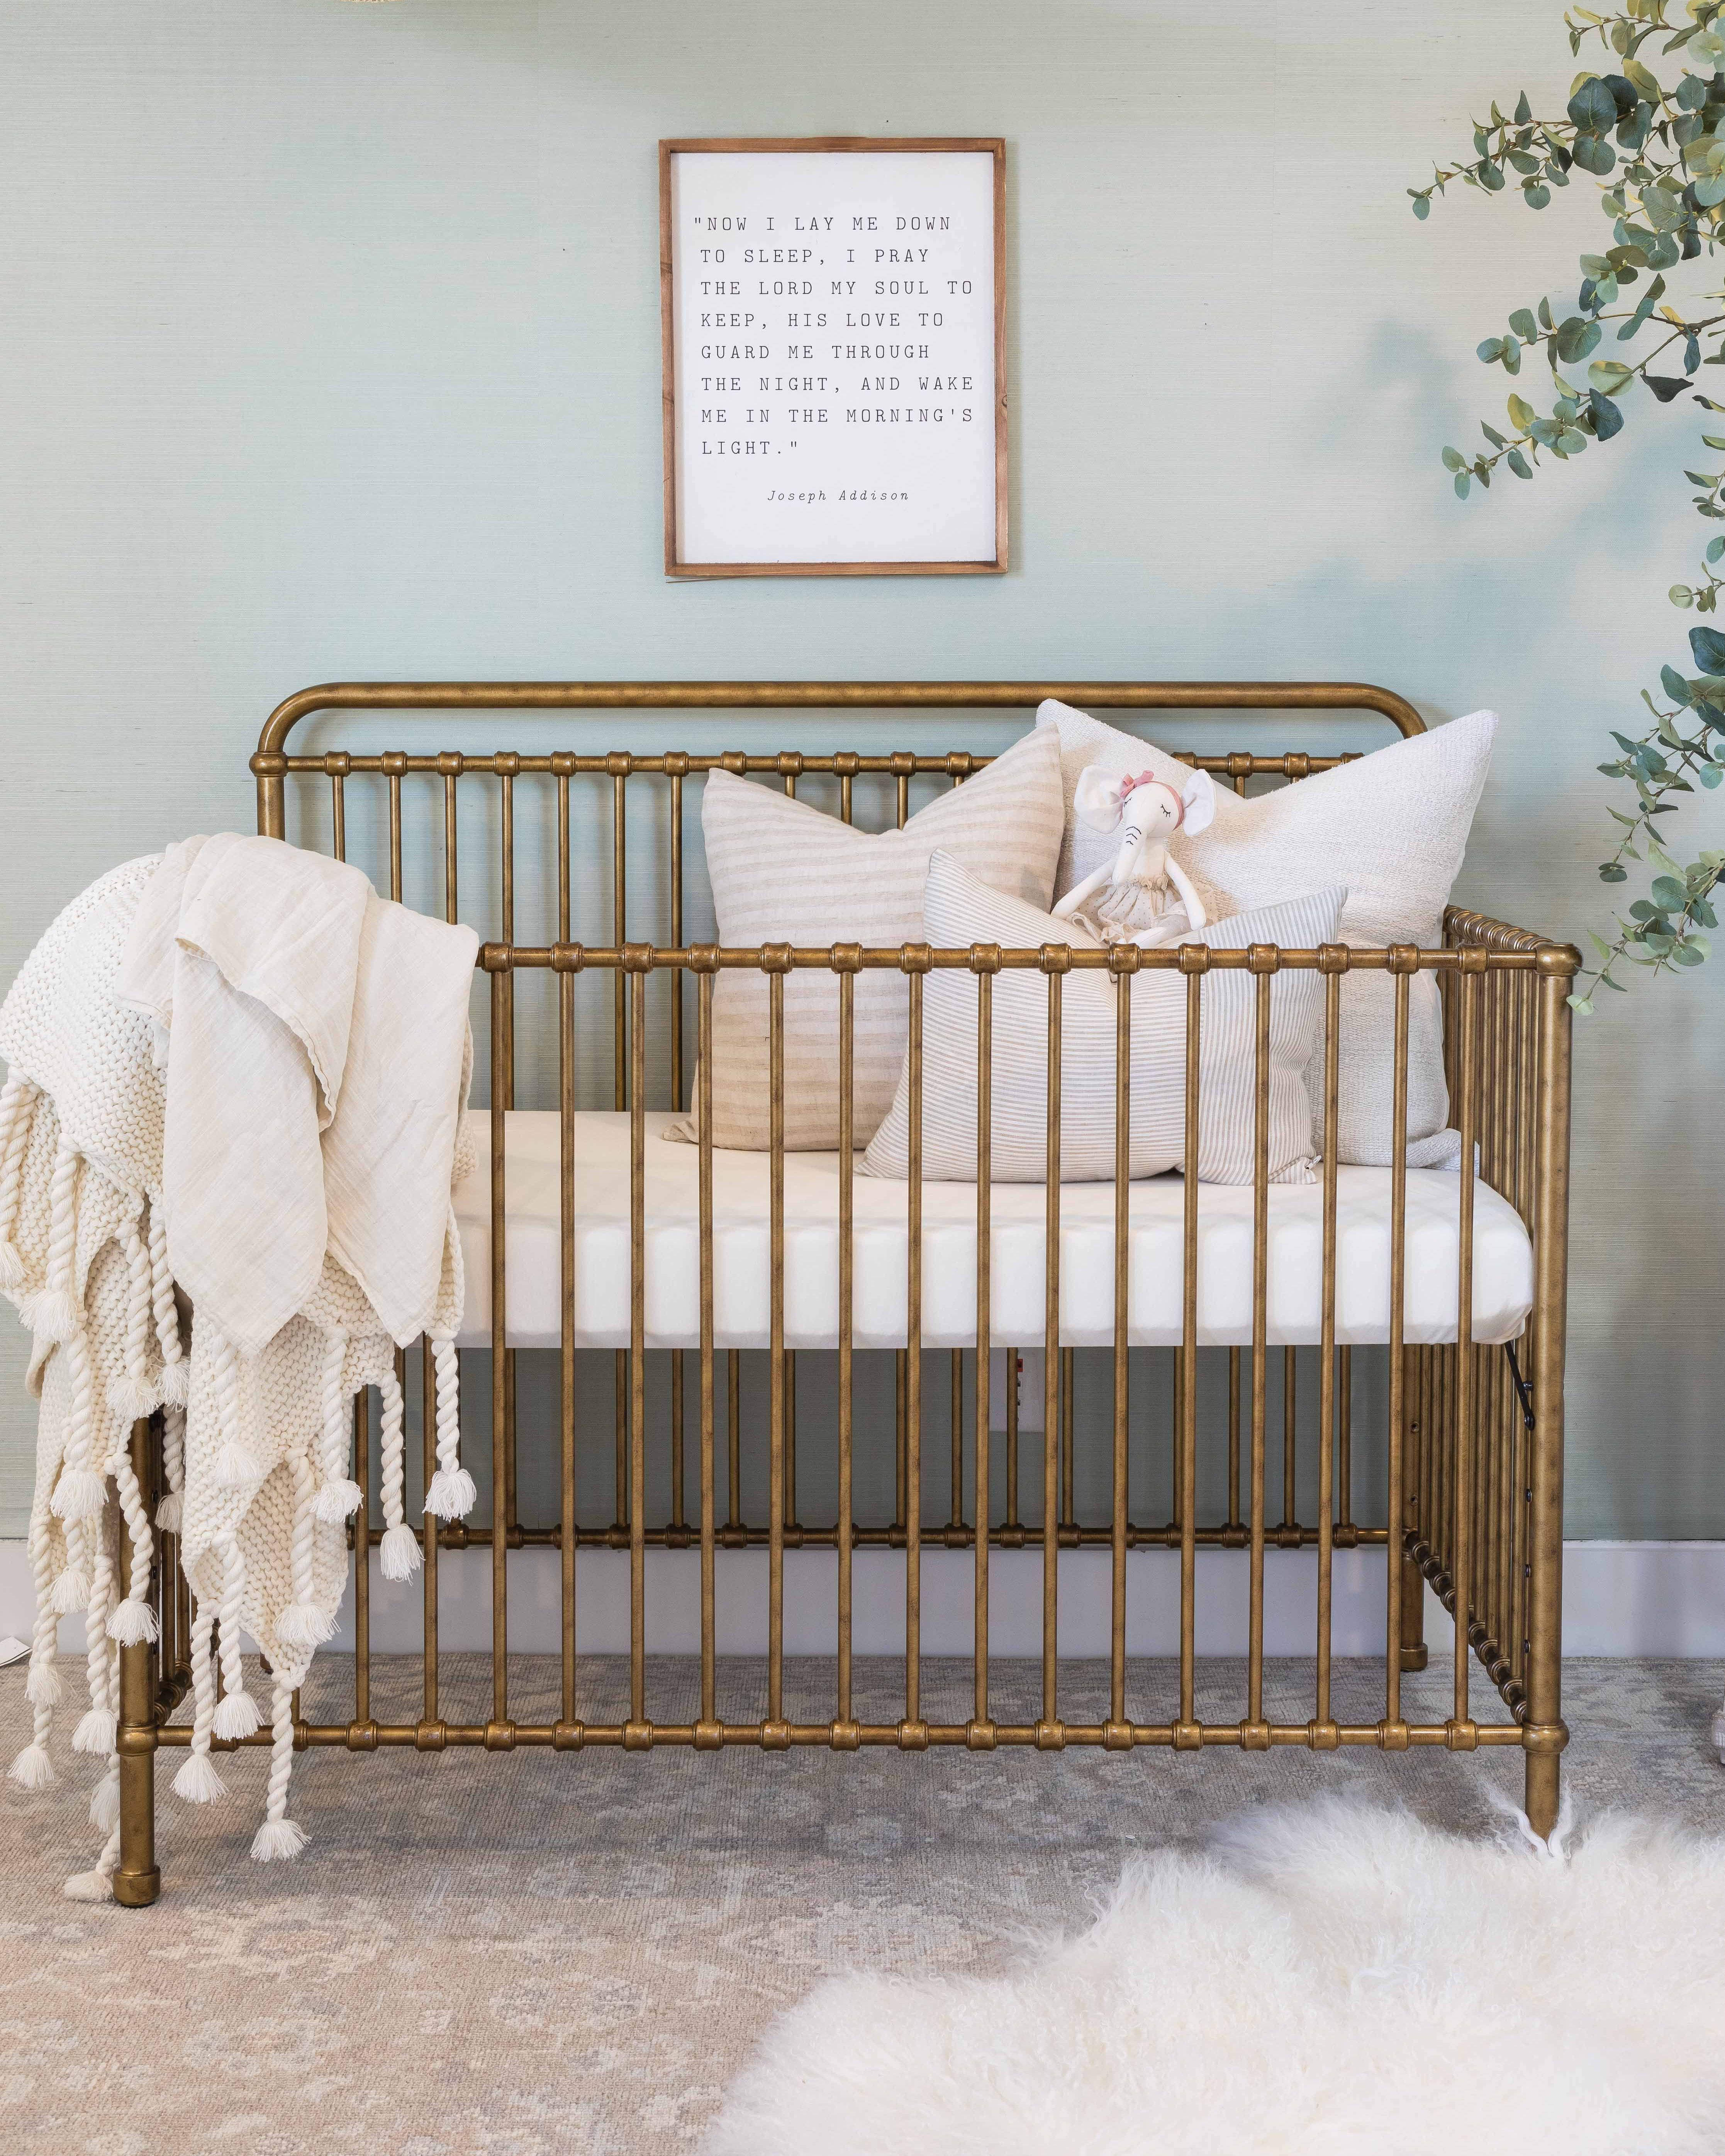 260 Little Ones Ideas In 2021 Nursery Room Design Baby Room Decor Colorful Kids Room